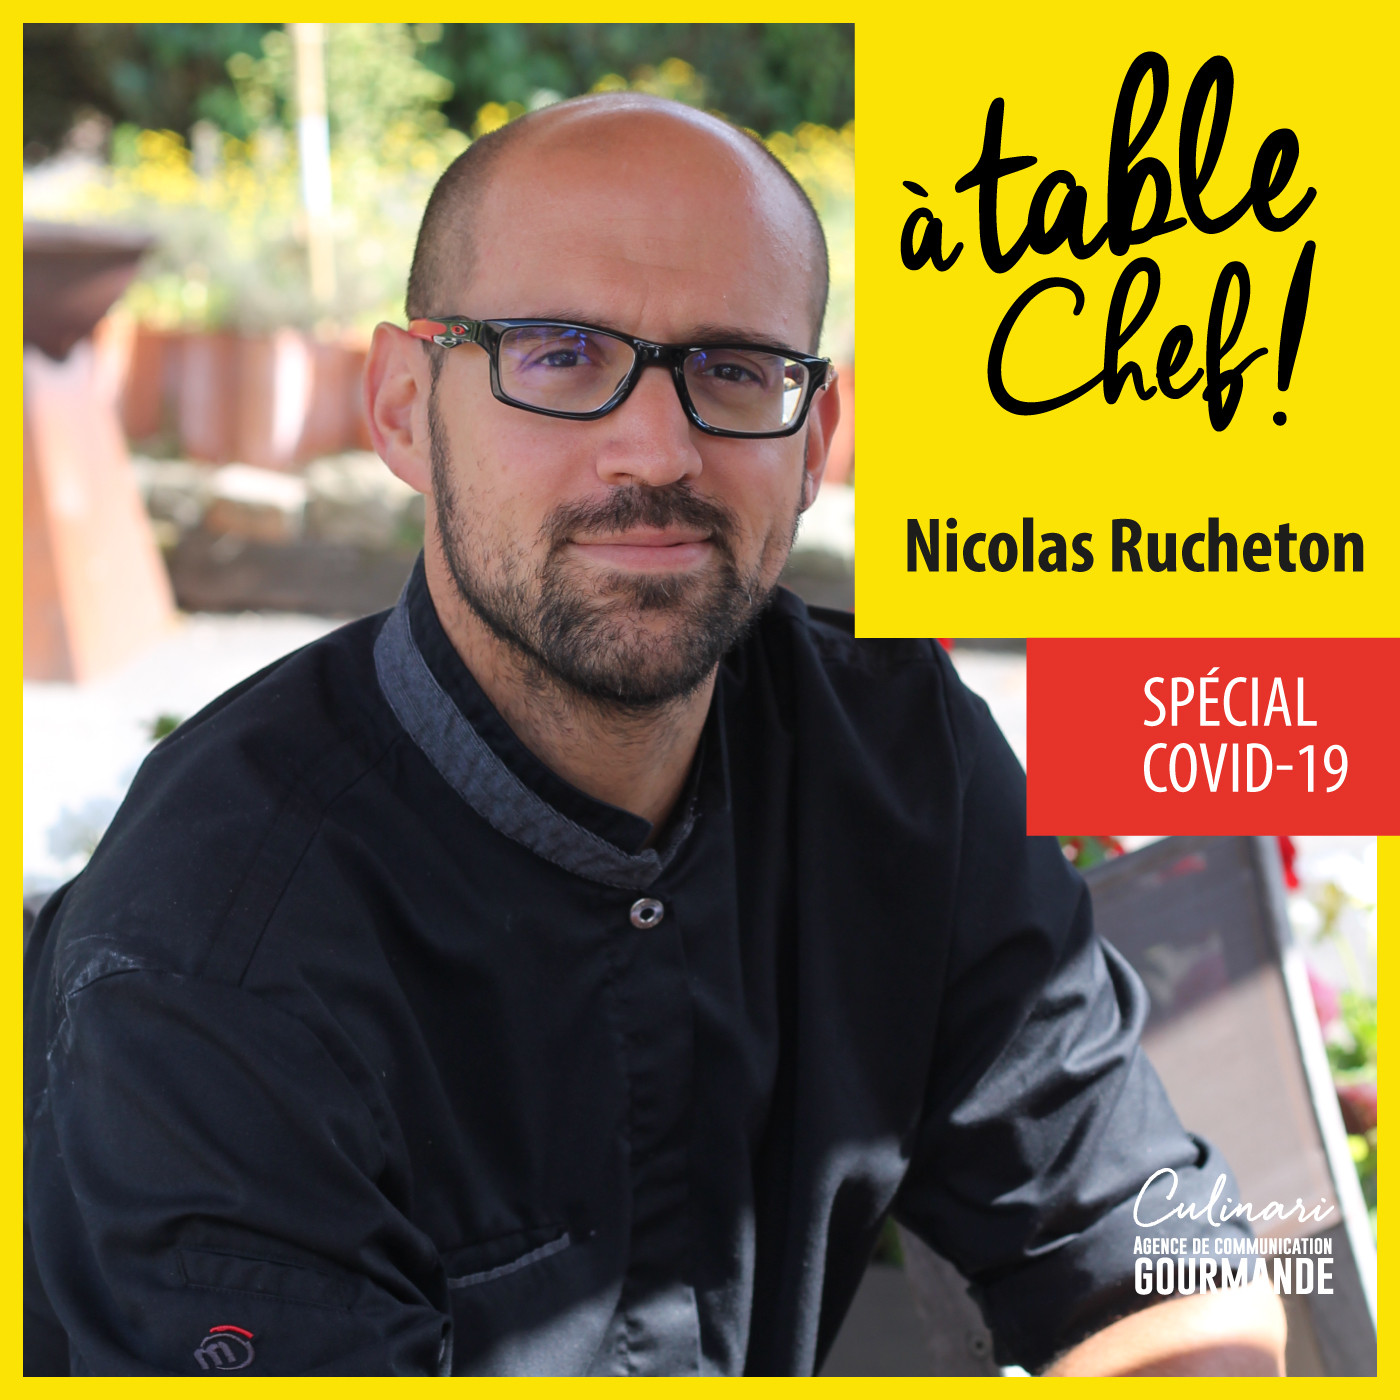 Chef Nicolas Rucheton